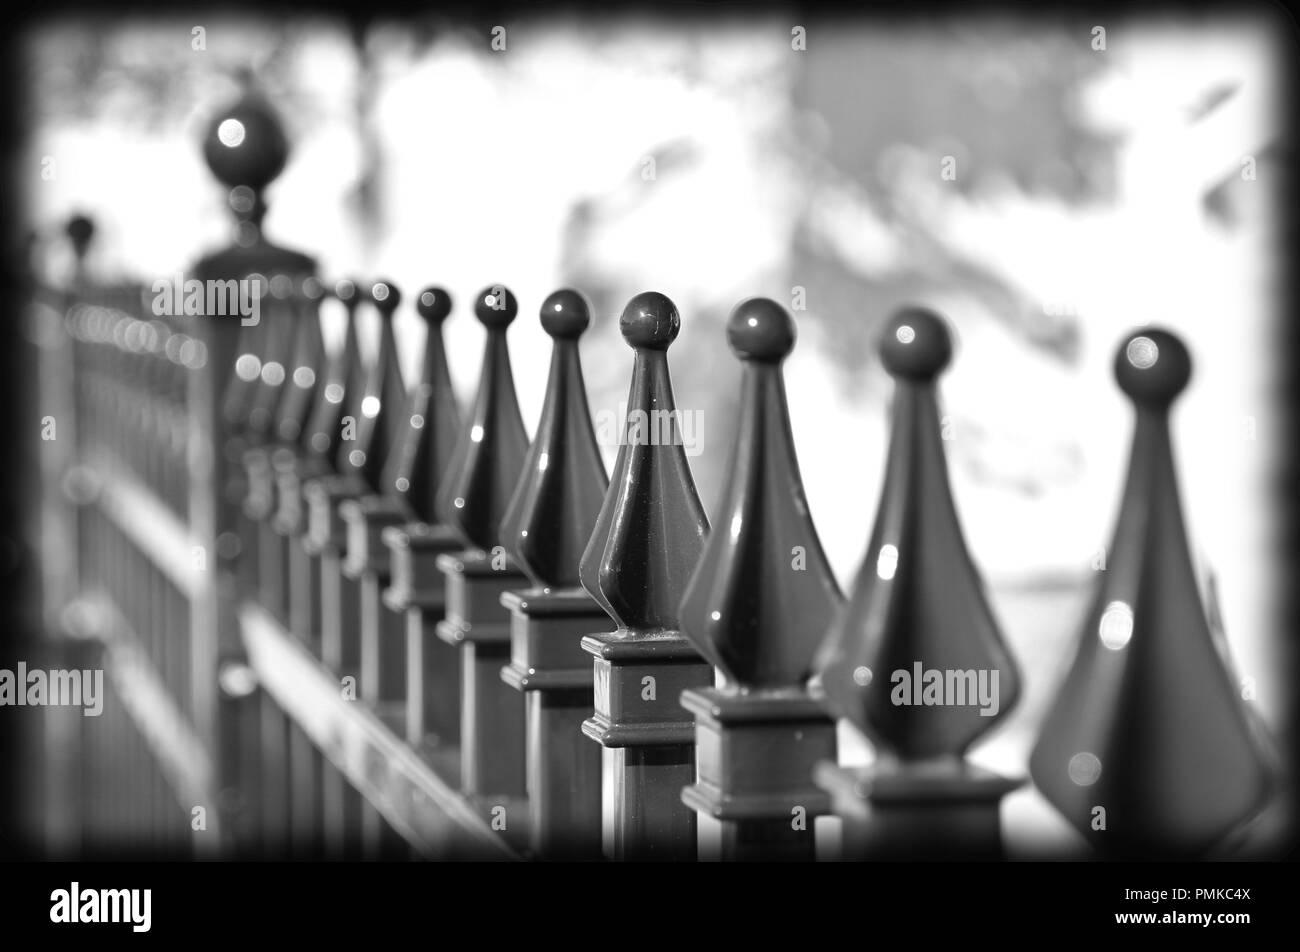 Iron Fence Closeup Stock Photo